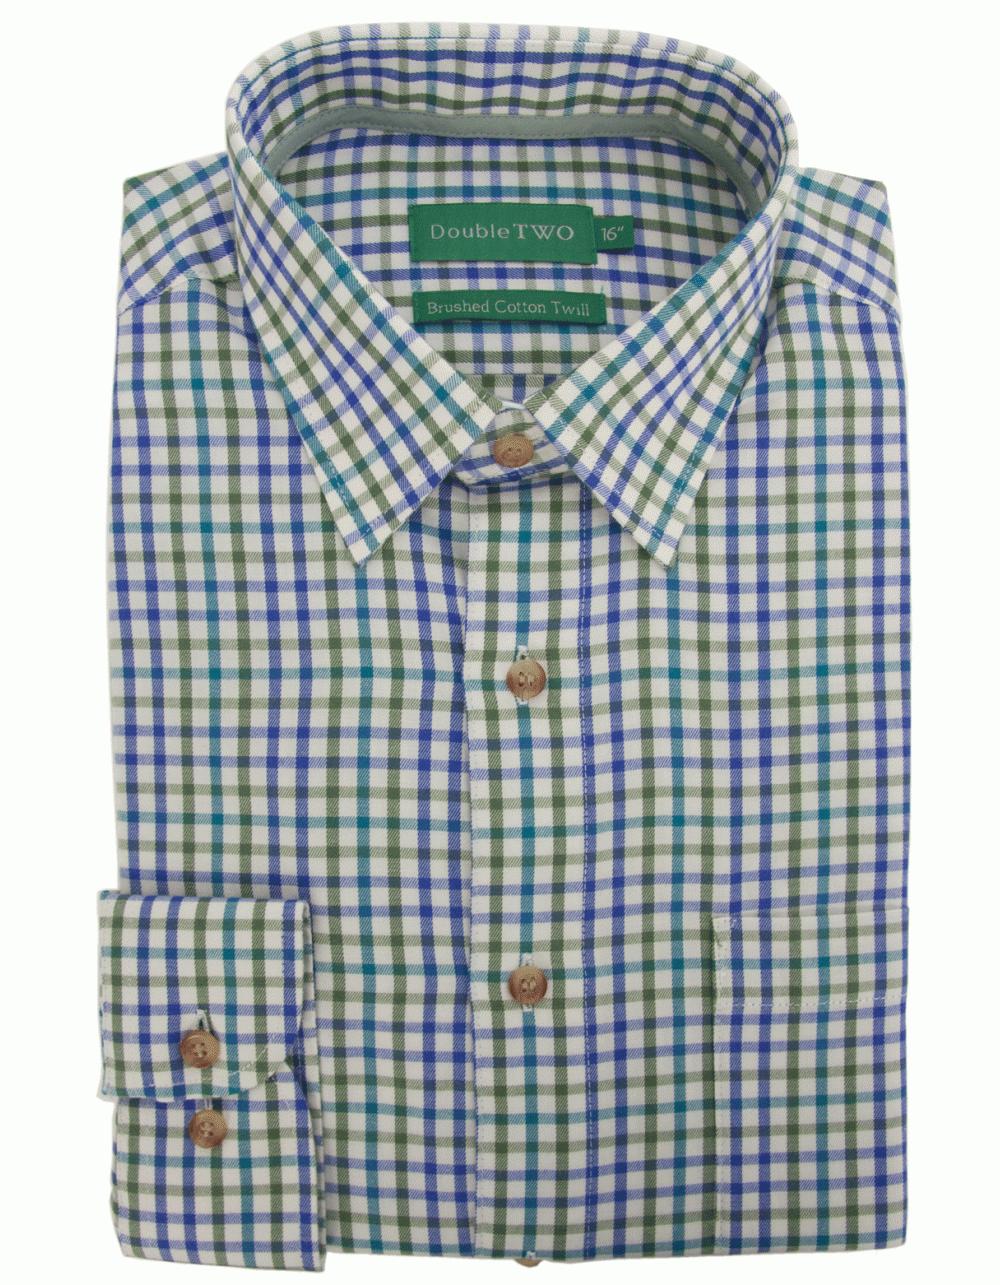 Brushed cotton twill check shirt sage fields menswear for Brushed cotton twill shirt